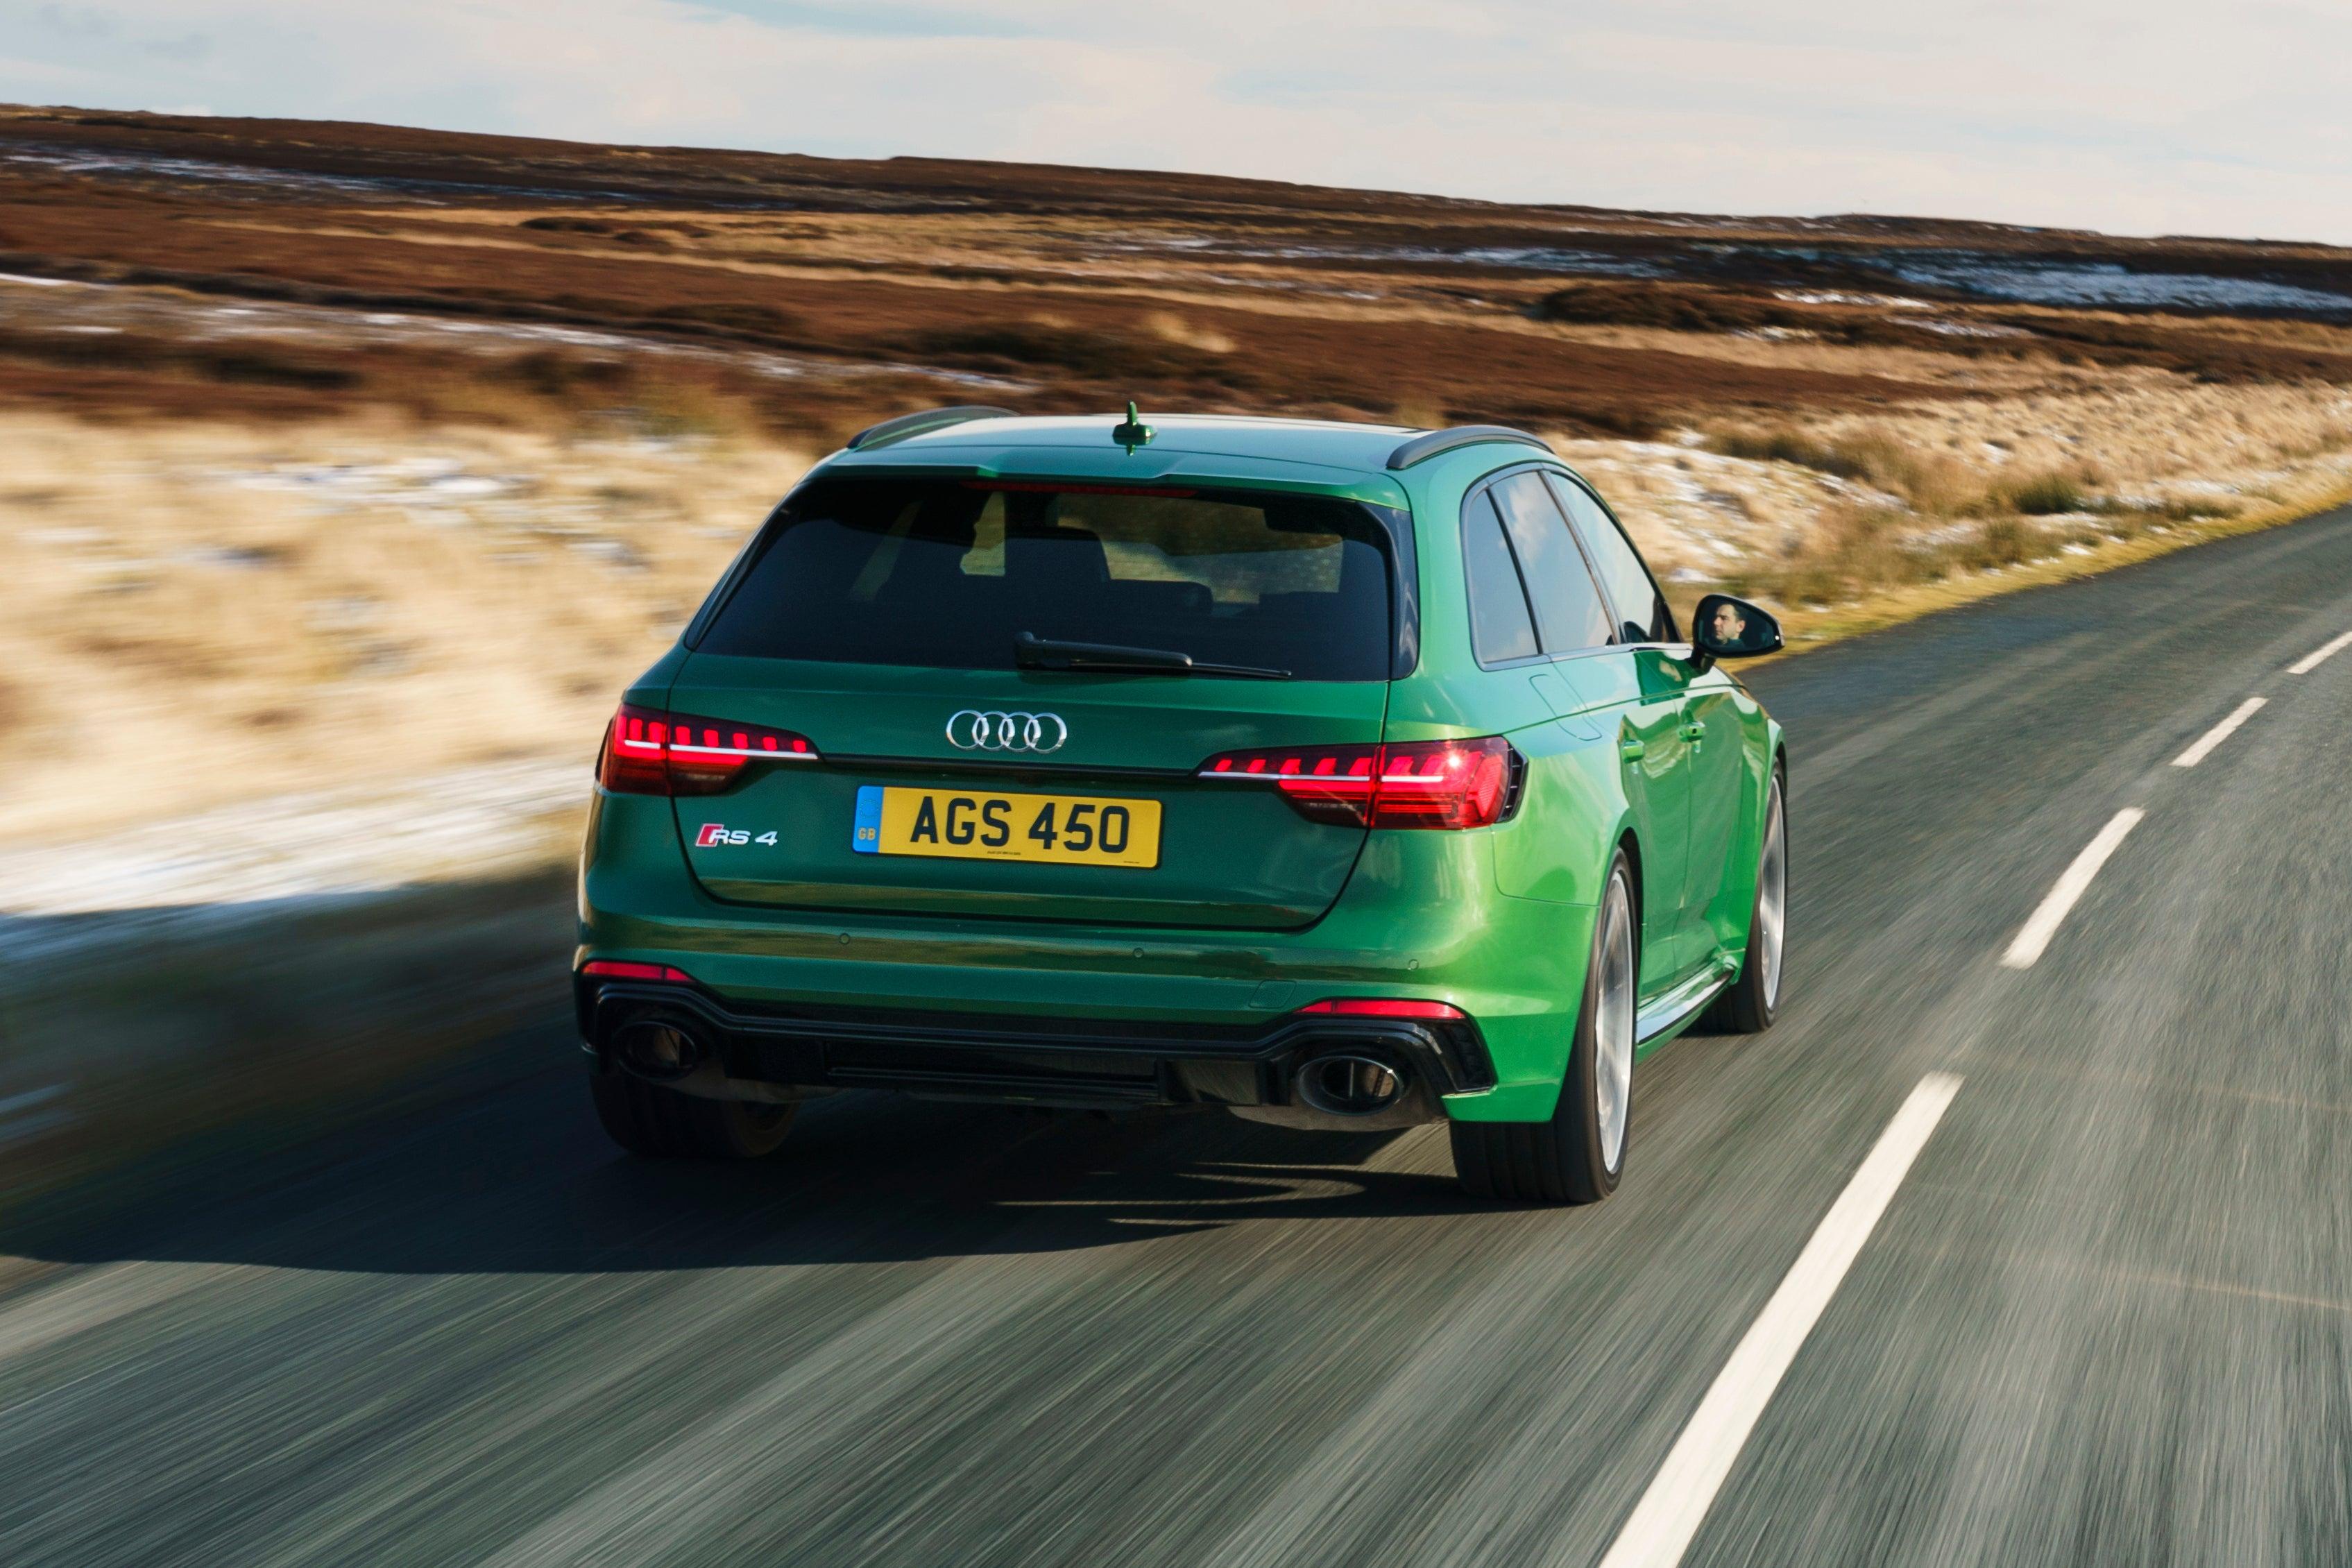 Audi RS4 Avant Driving Back